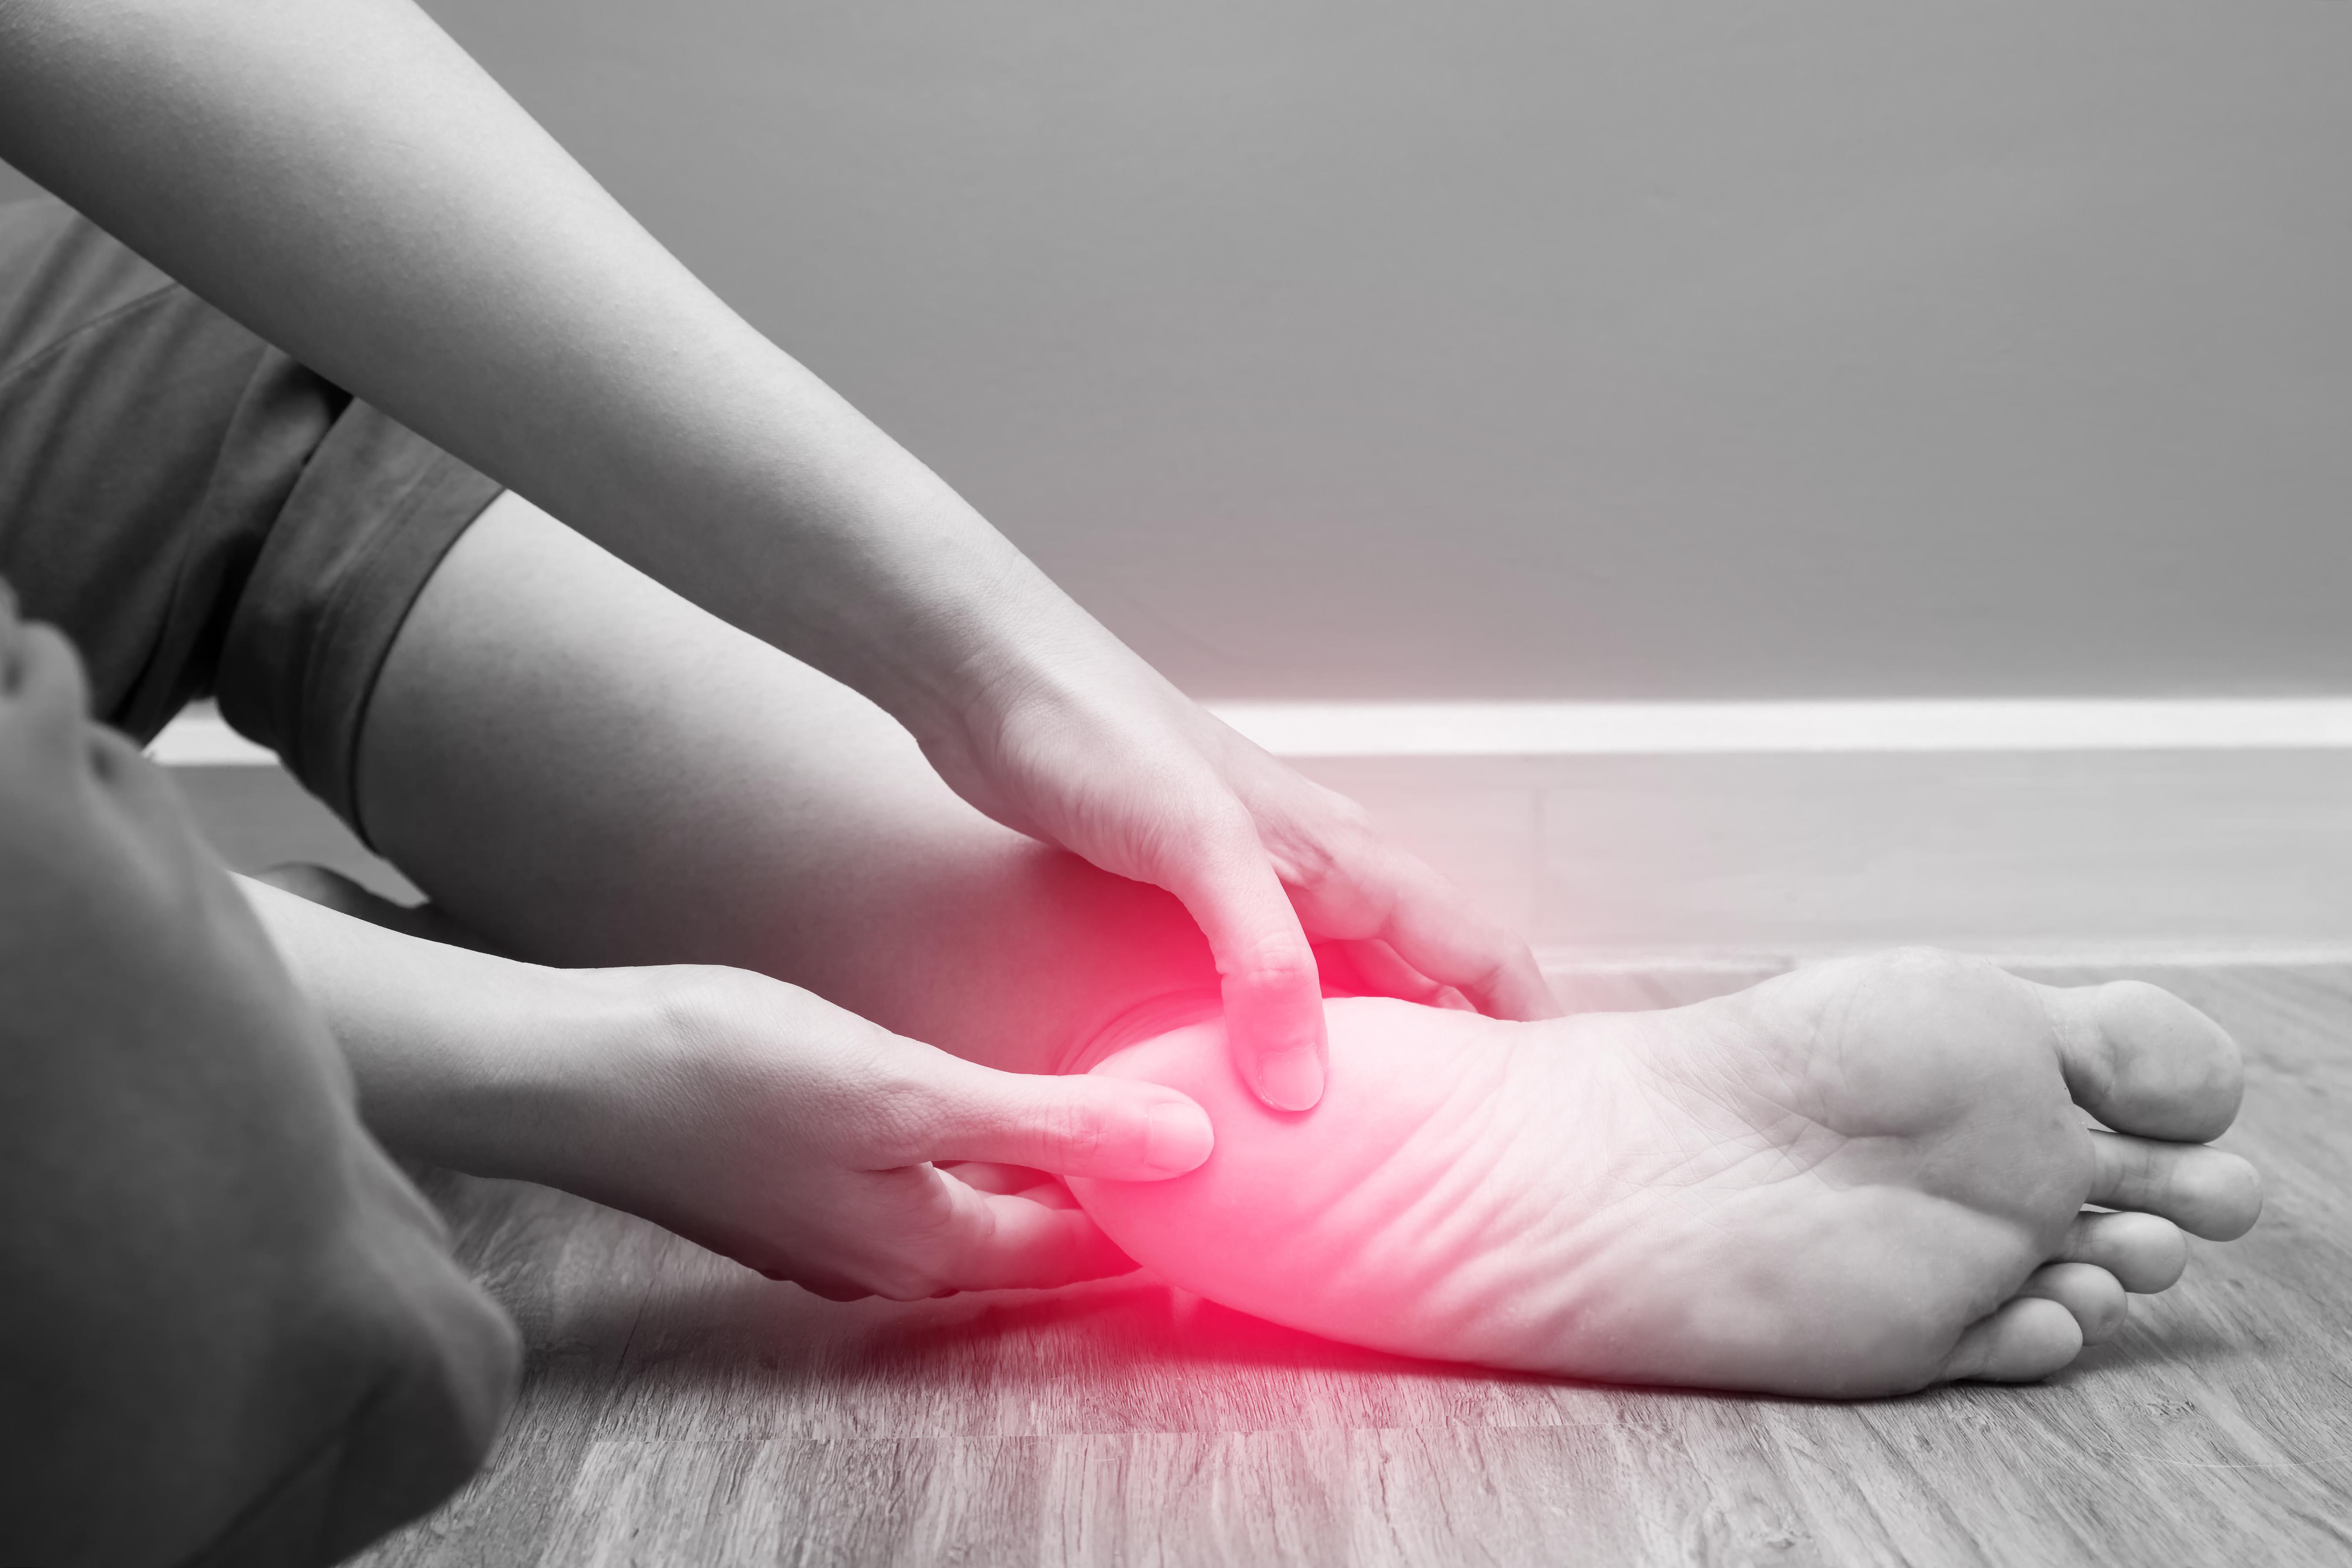 Exercises to Heal Heel Pain